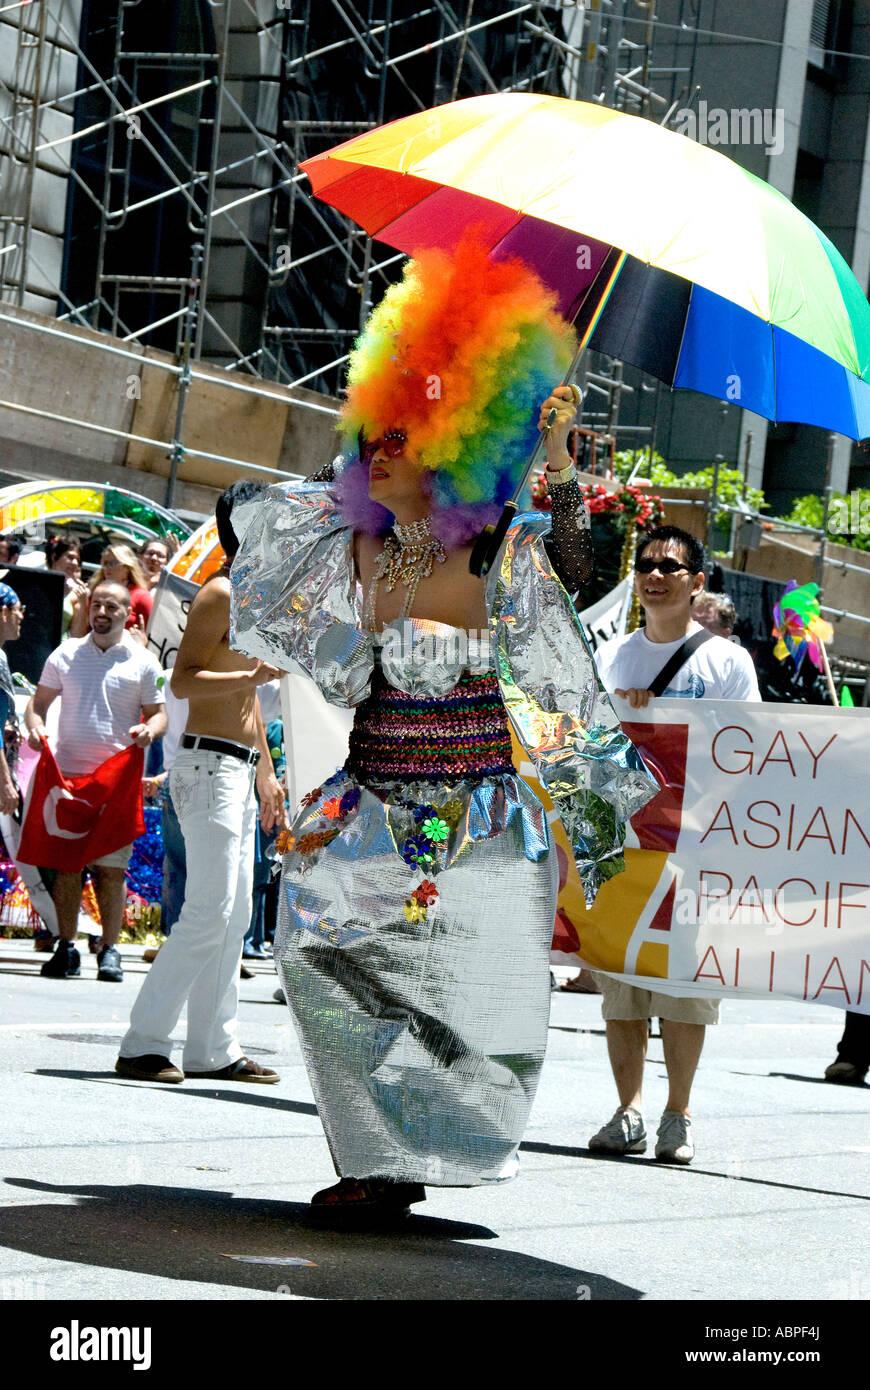 proformer in gay parade - Stock Image